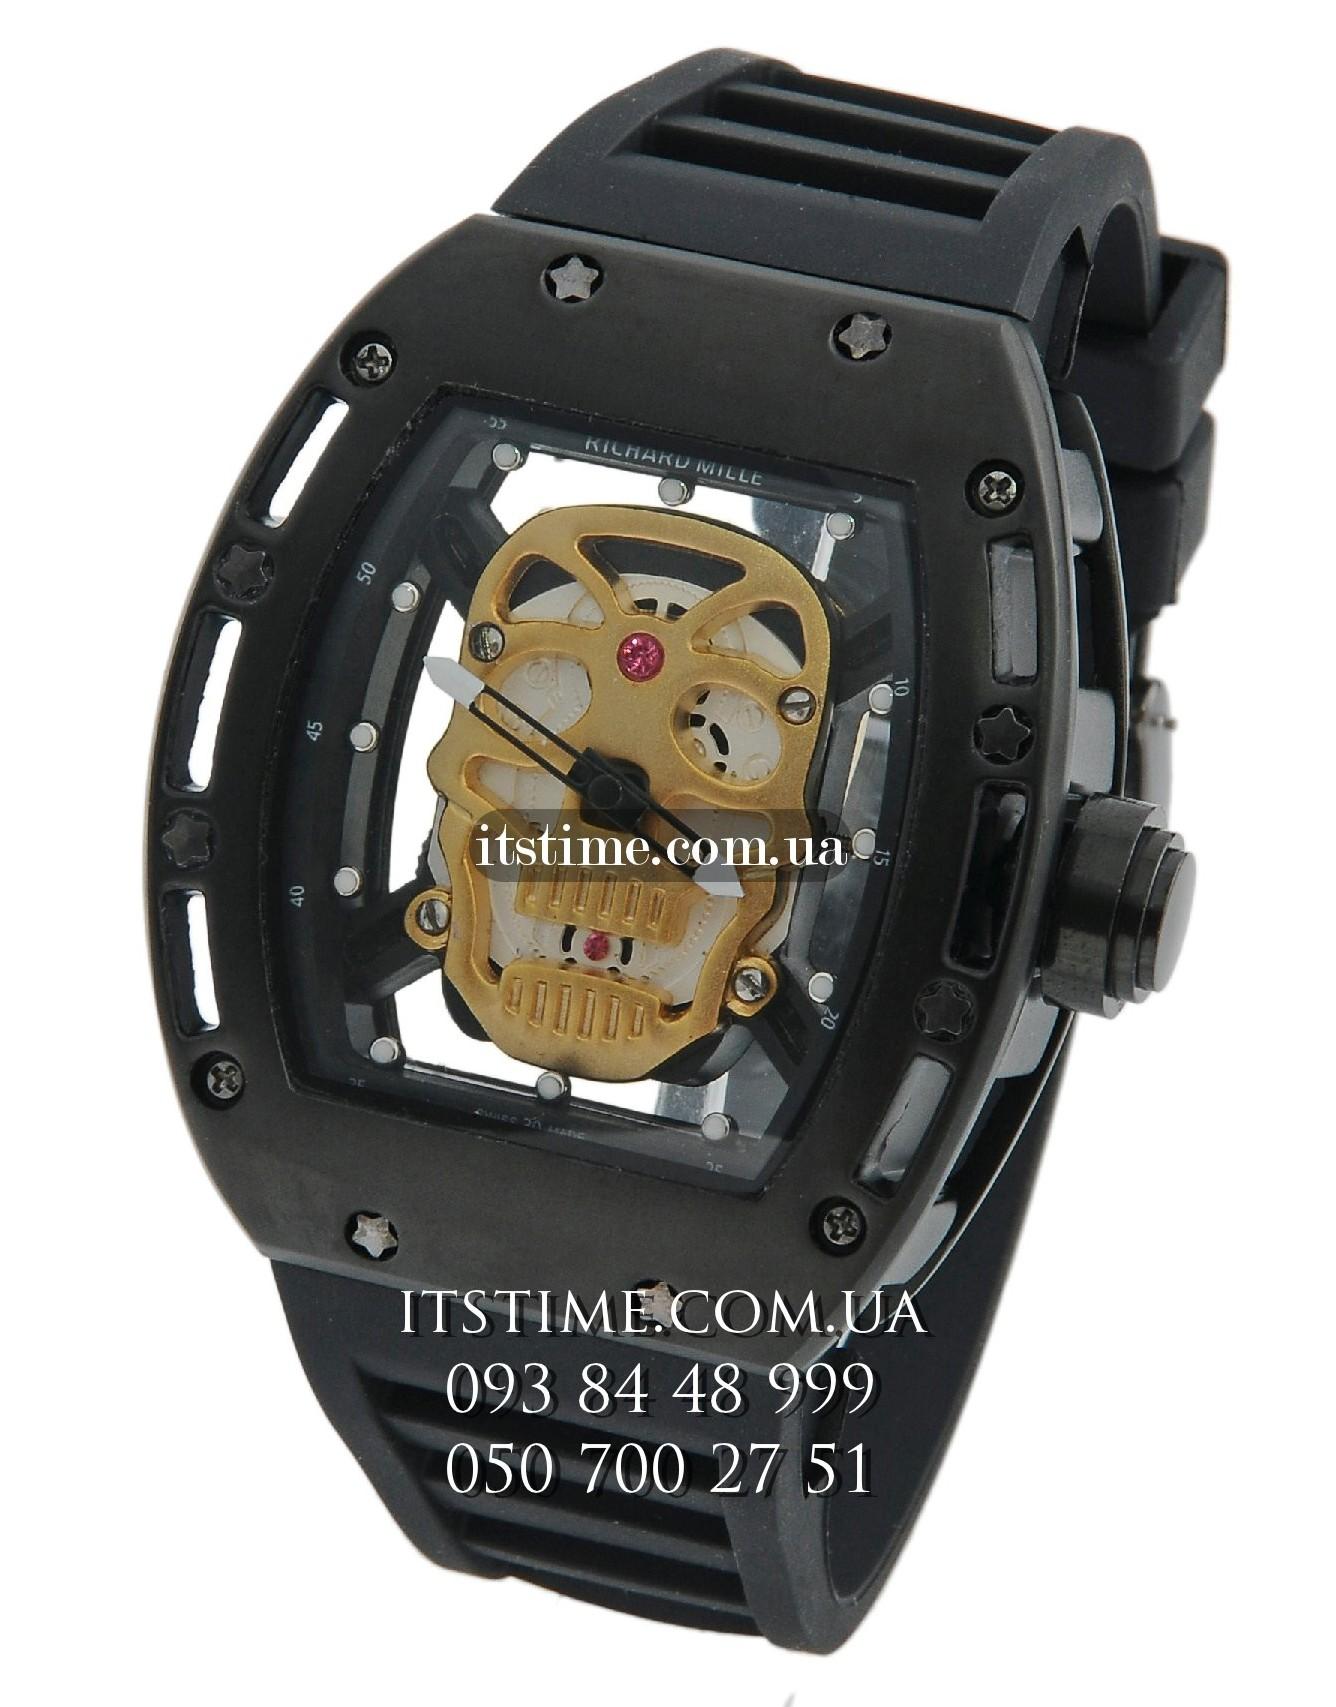 Часы rm 52 01 купить часы наручные статья